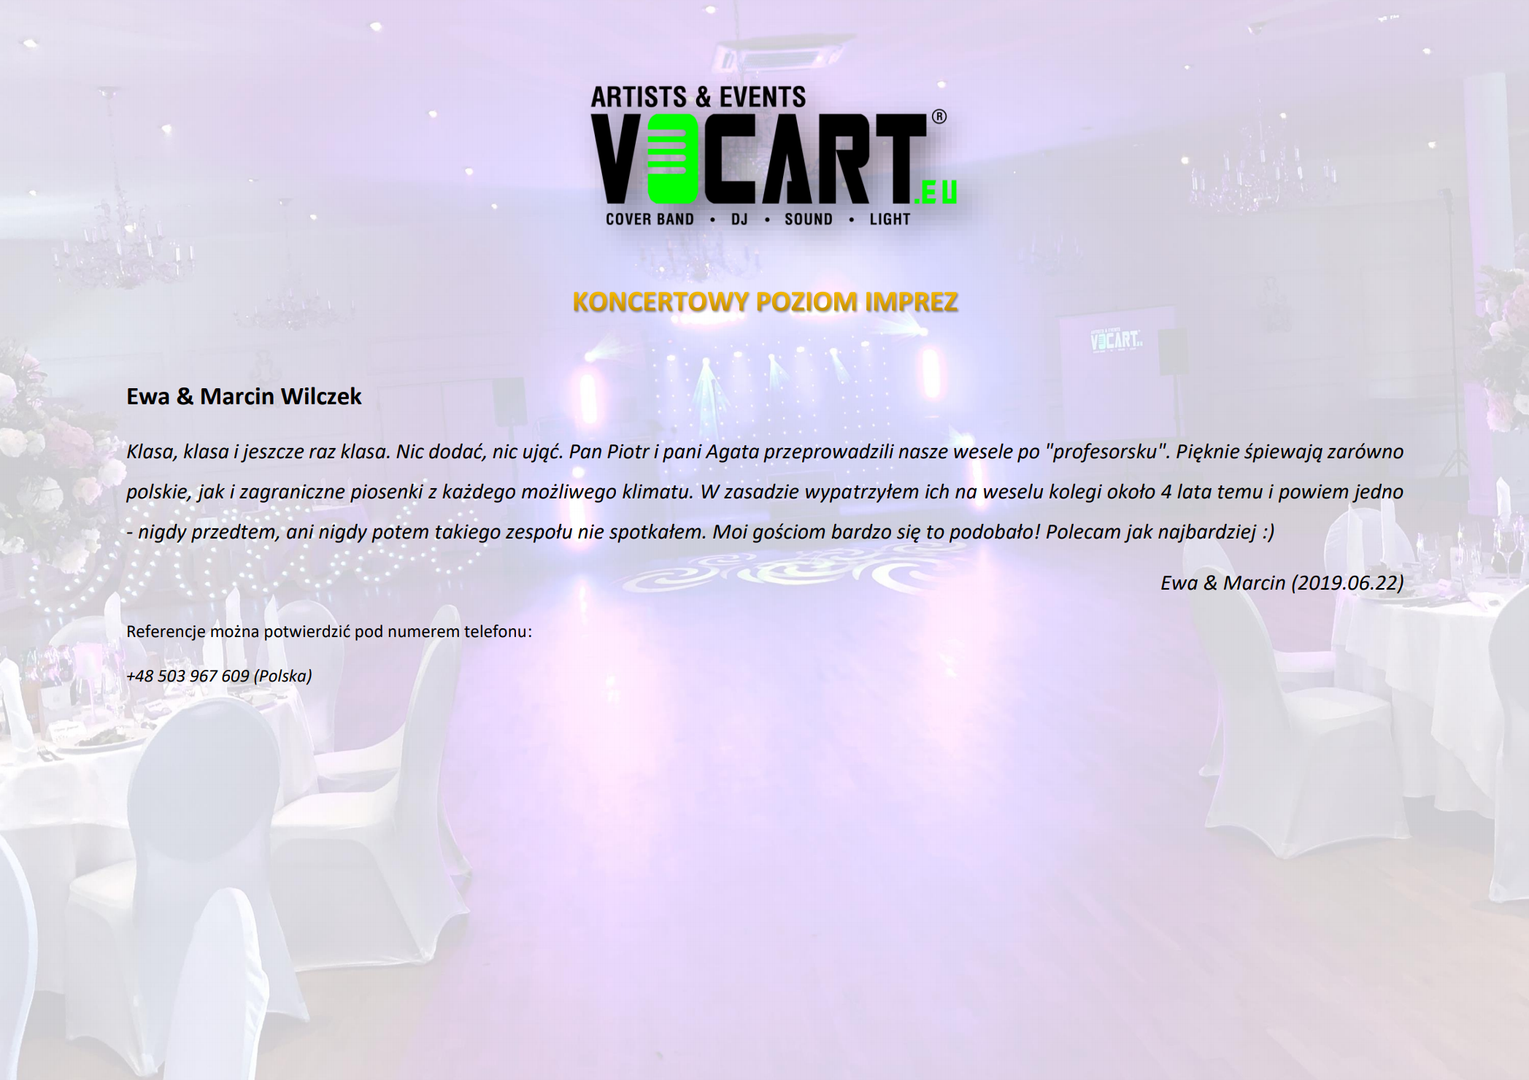 VOCART - Referencje - 2019.06.22 - Ewa &